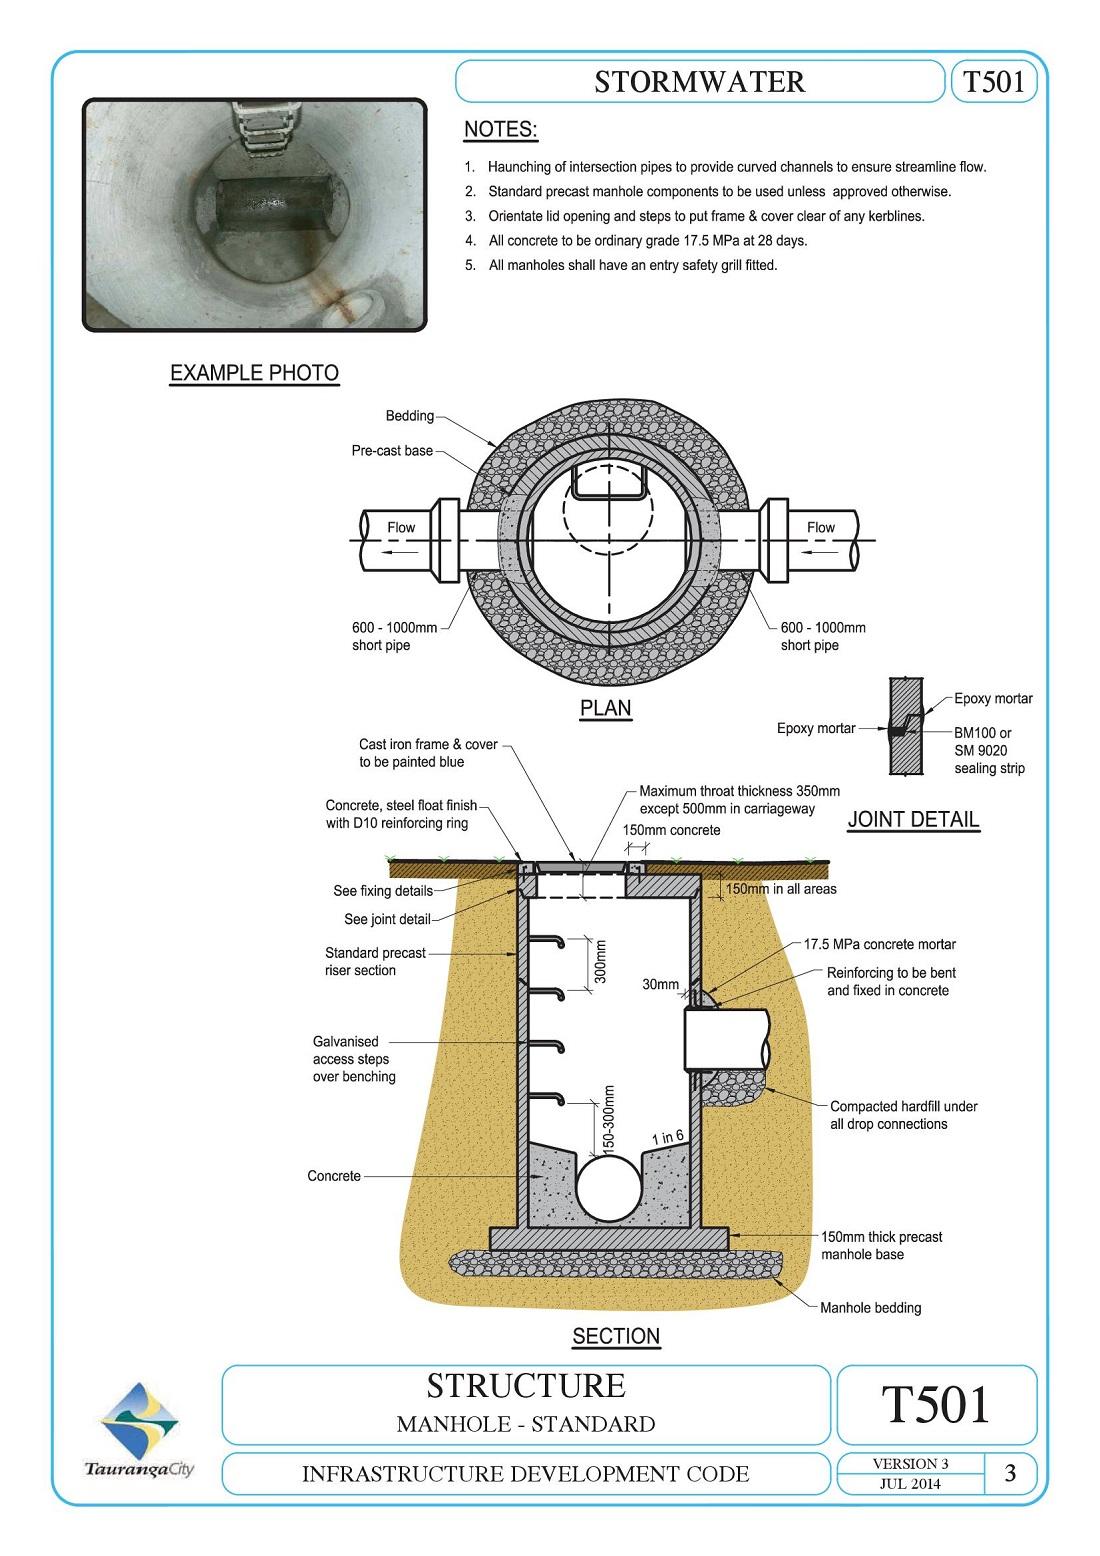 Manhole - Standard